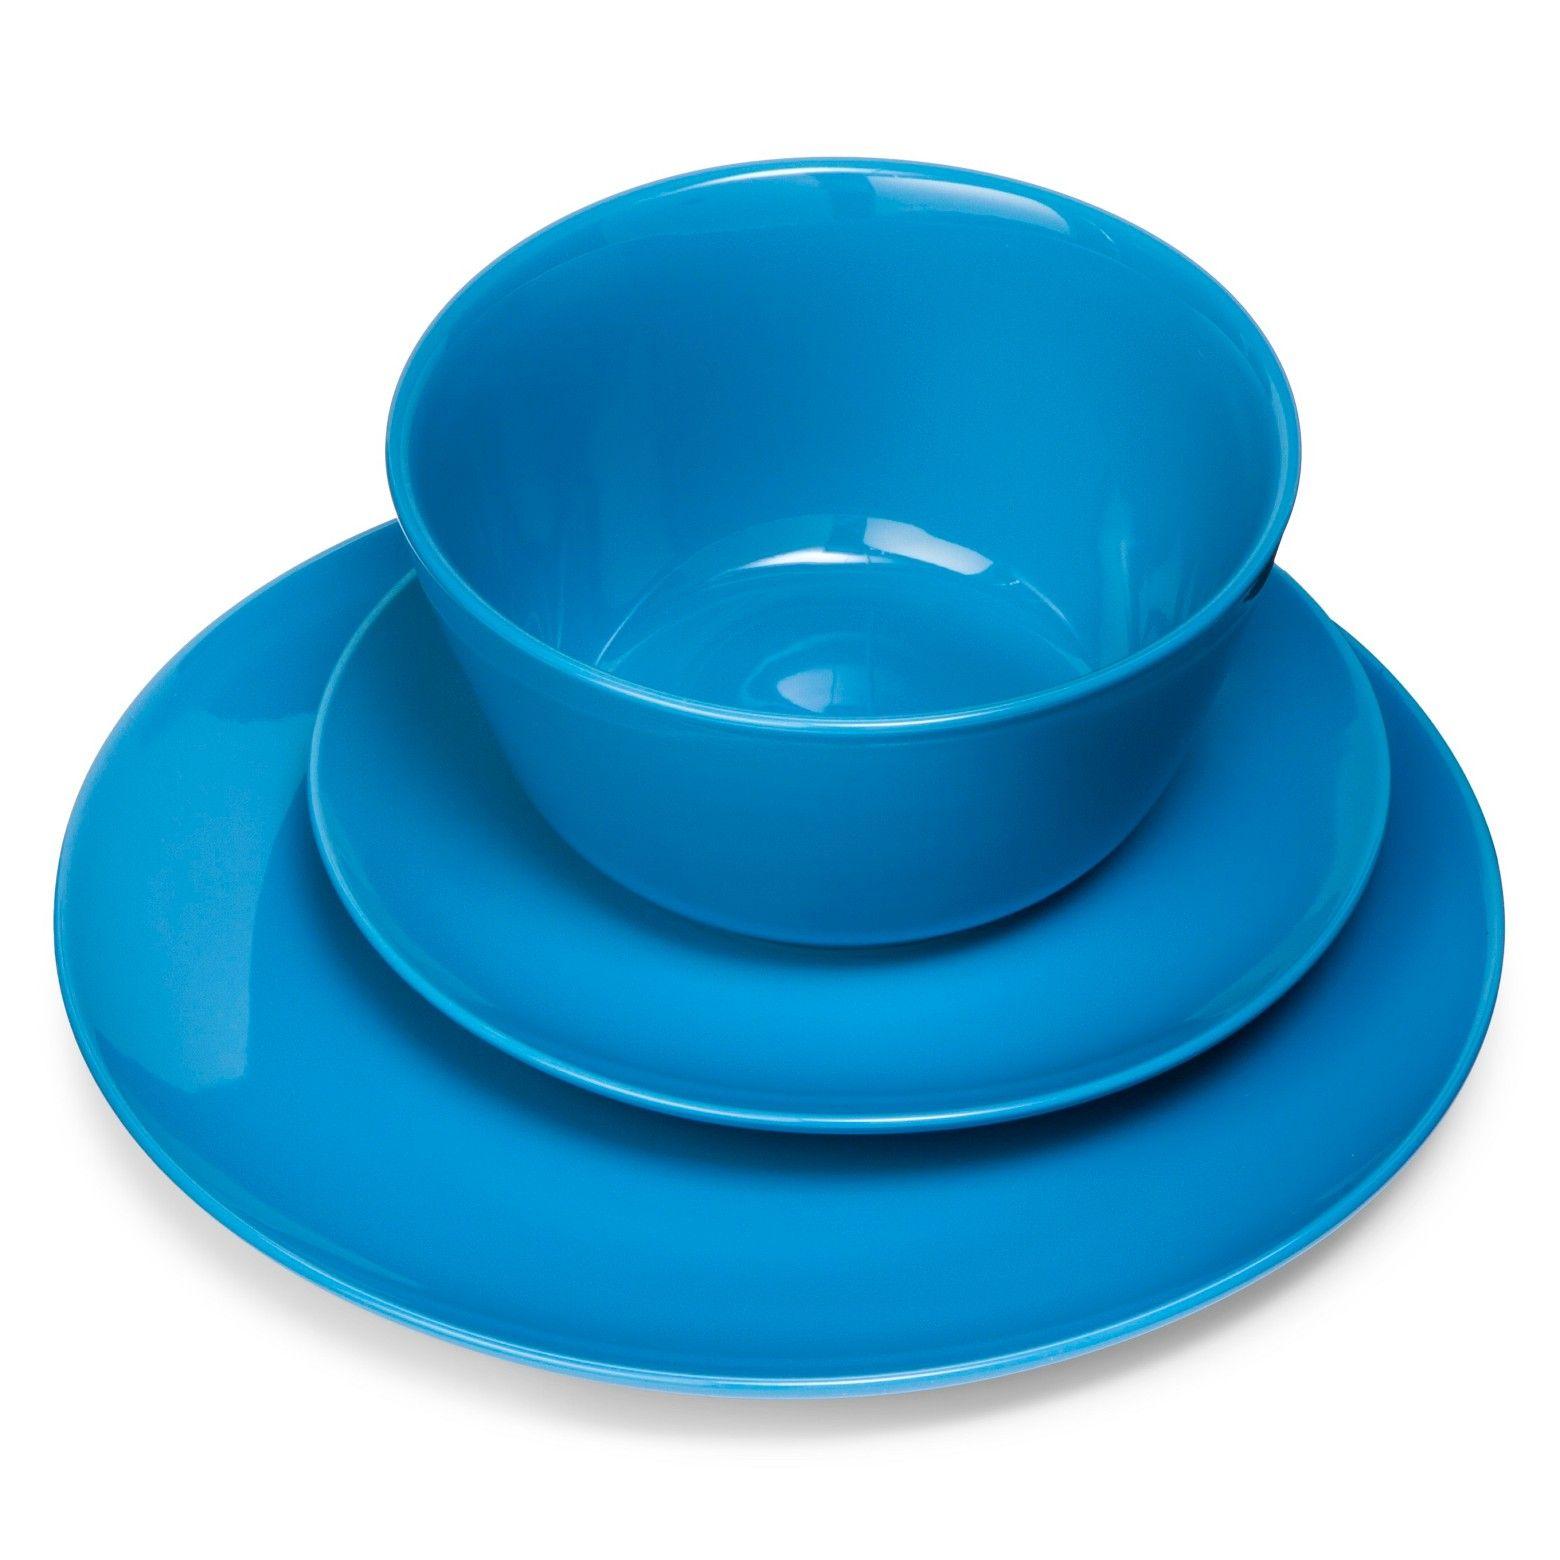 Coupe 12pc Dinnerware Set Blue Room Essentials Dinnerware